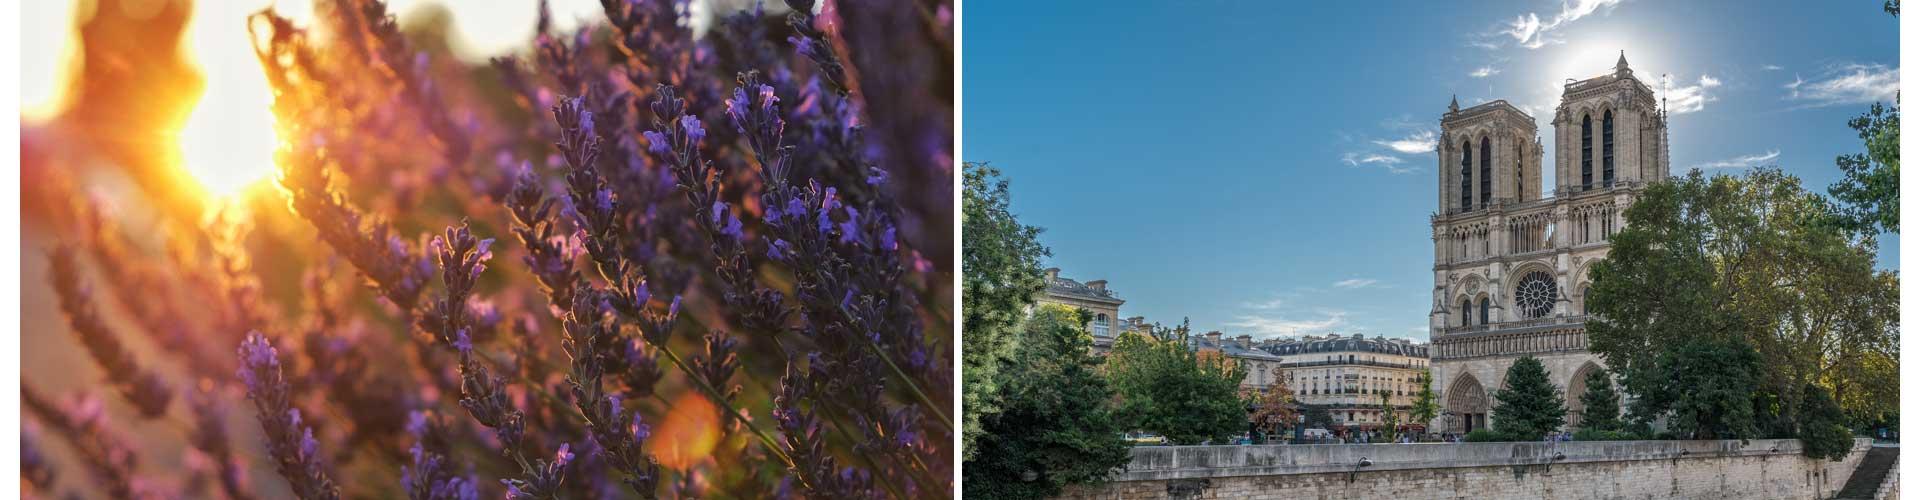 Calmondo frankreich reisetagebuch notre dame paris lavendel provence